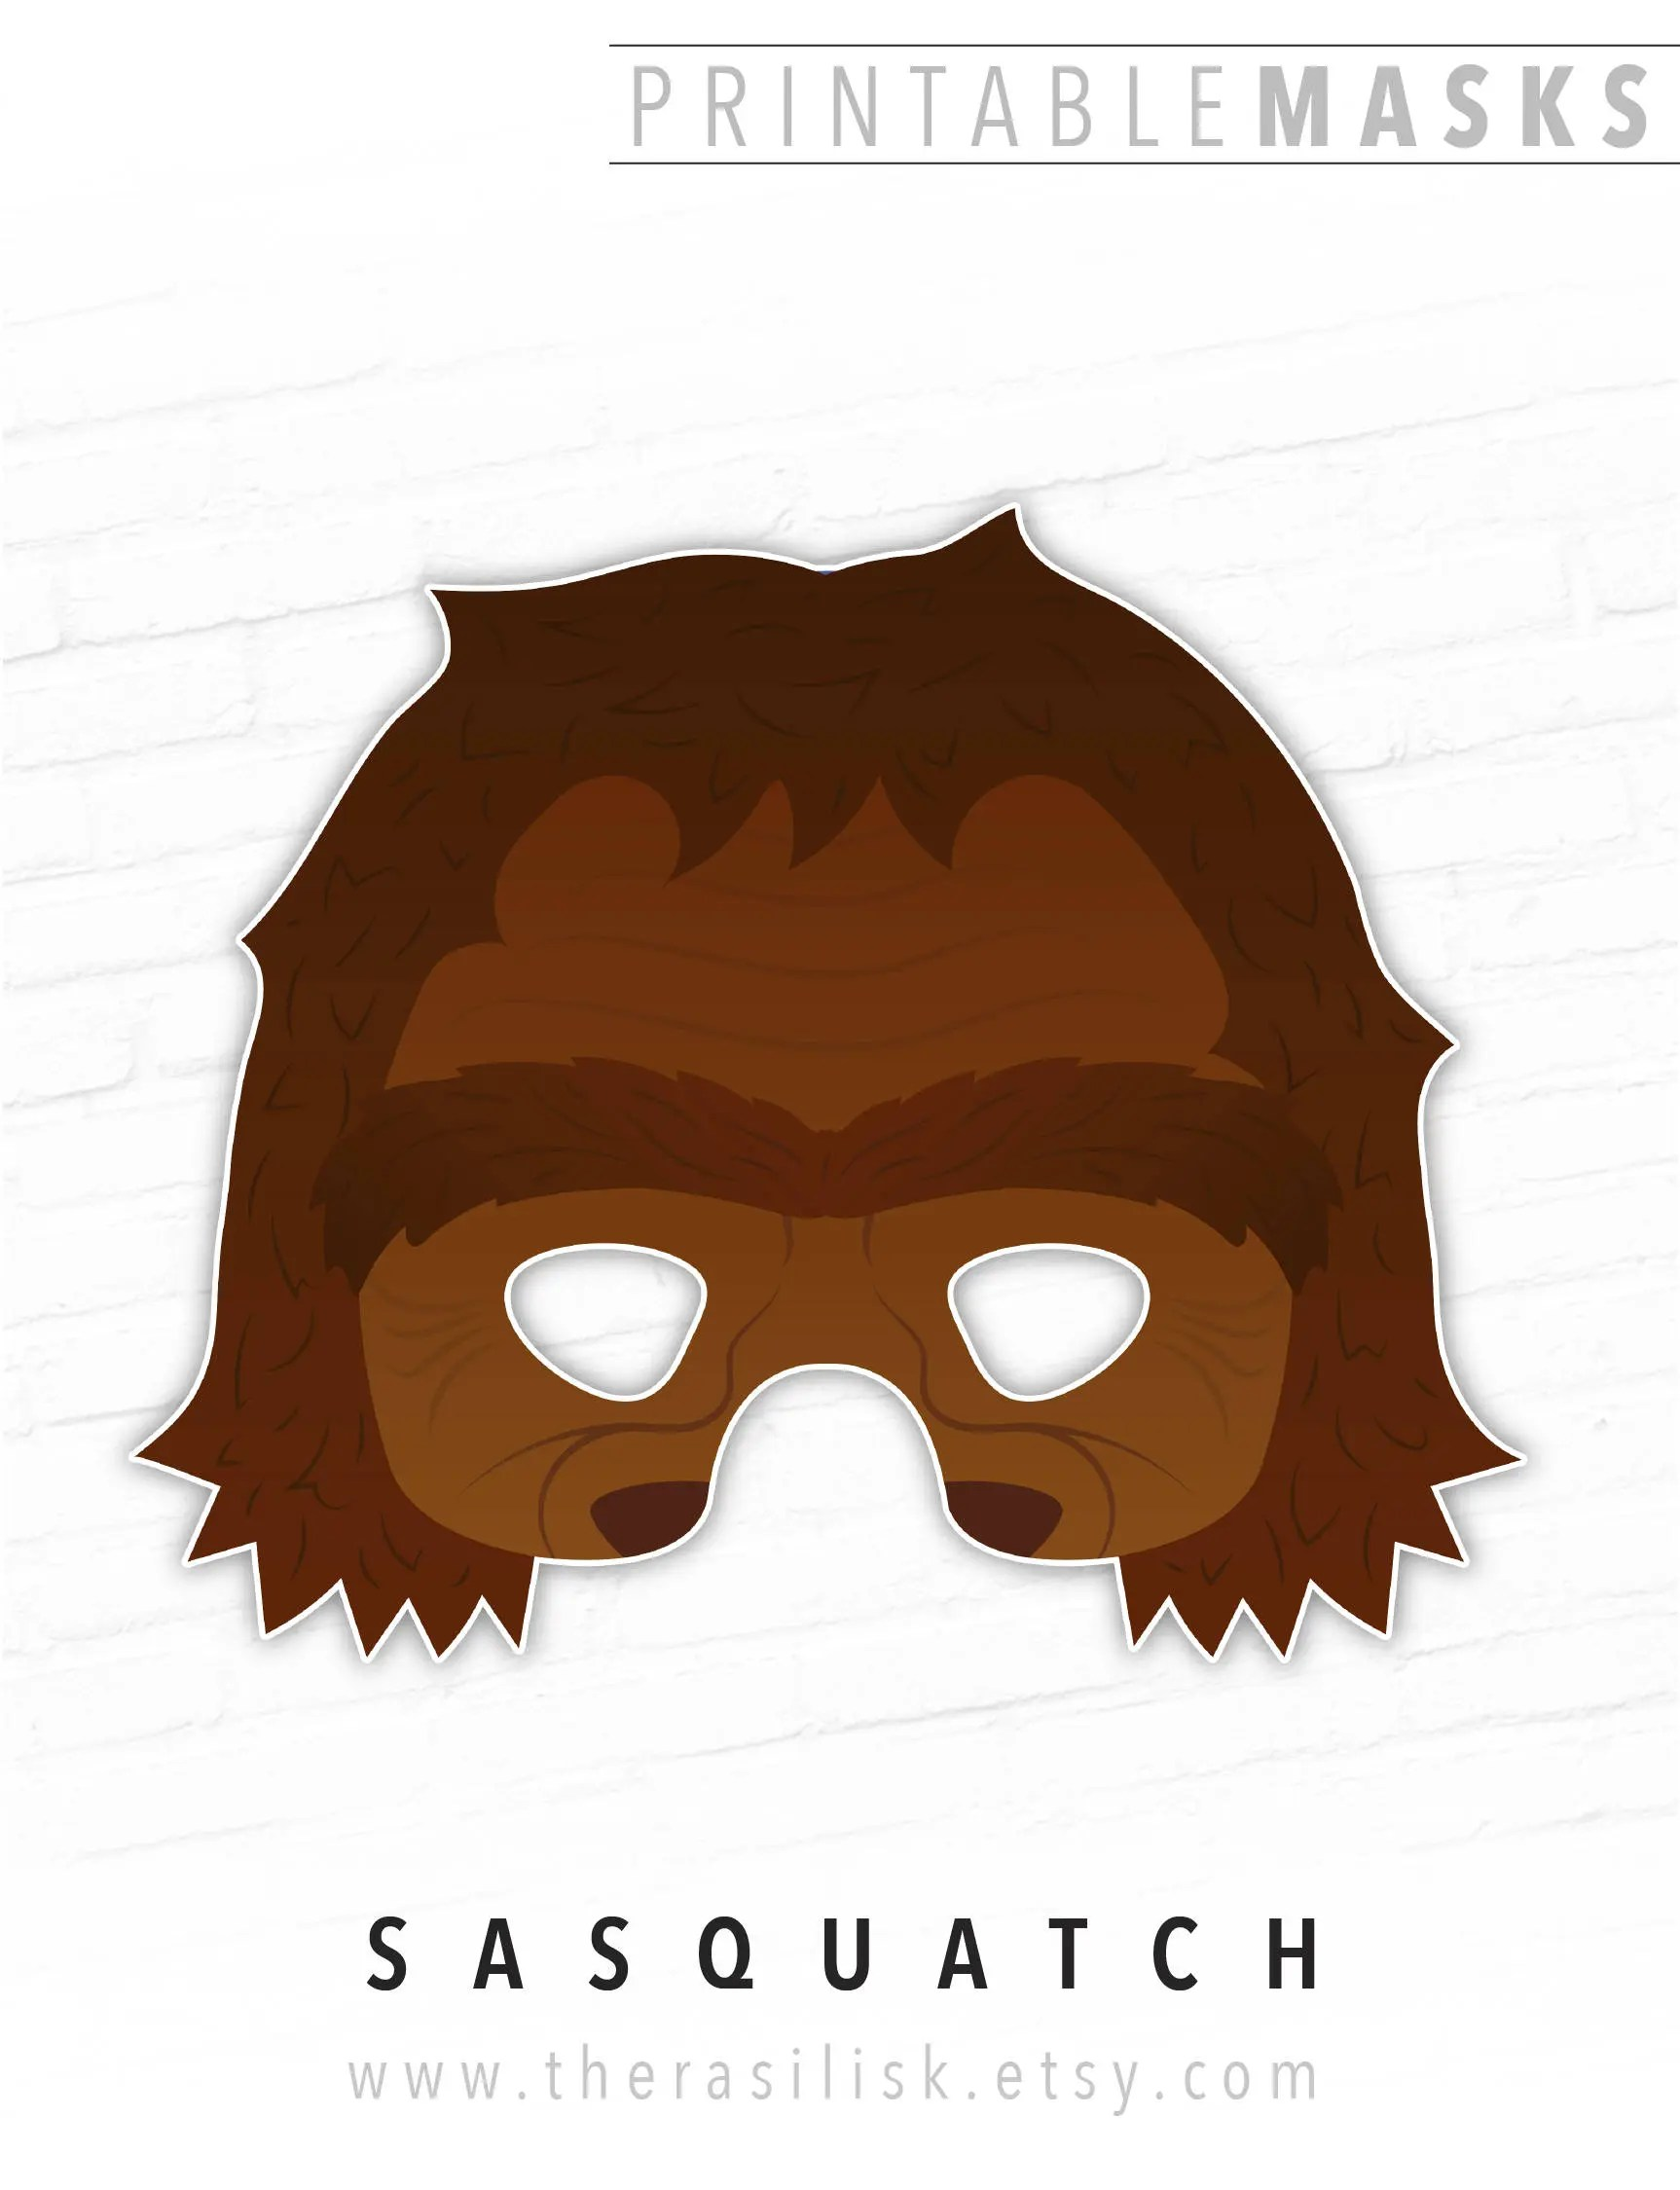 Printable Mask Halloween Mask Sasquatch Big Foot Monster Etsy